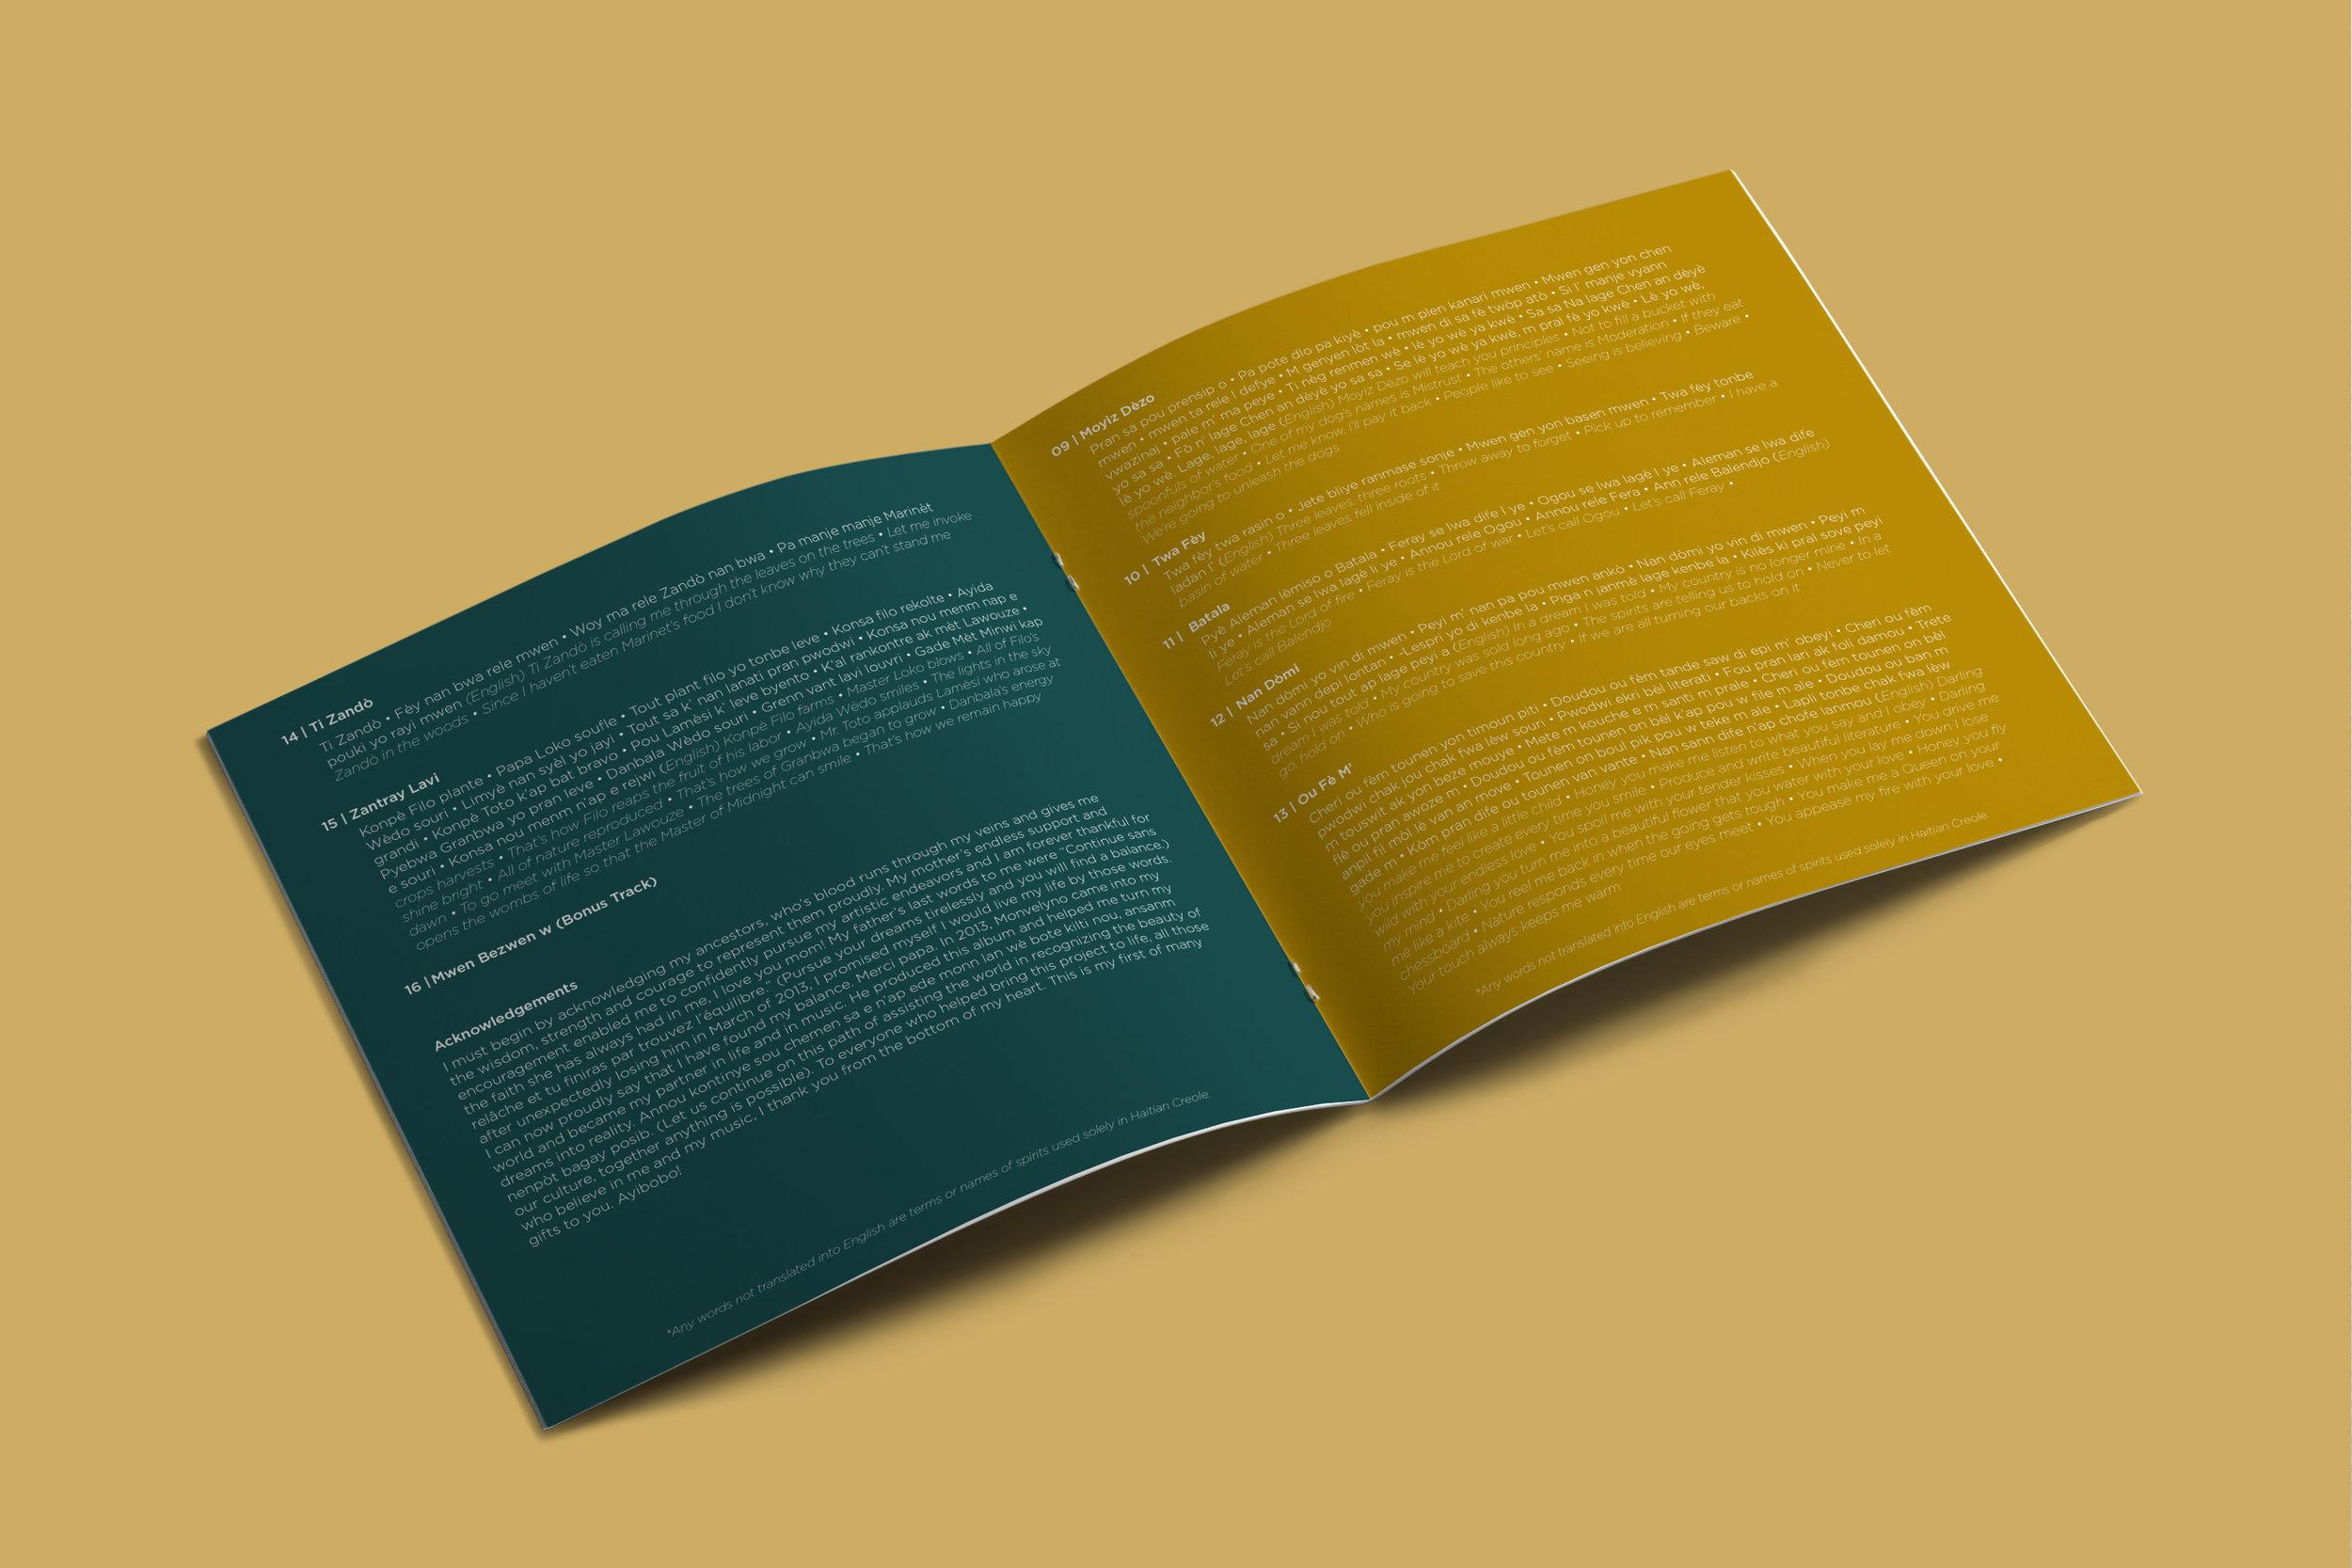 reba-joy-riva-nyri-inside-spread-2.jpg